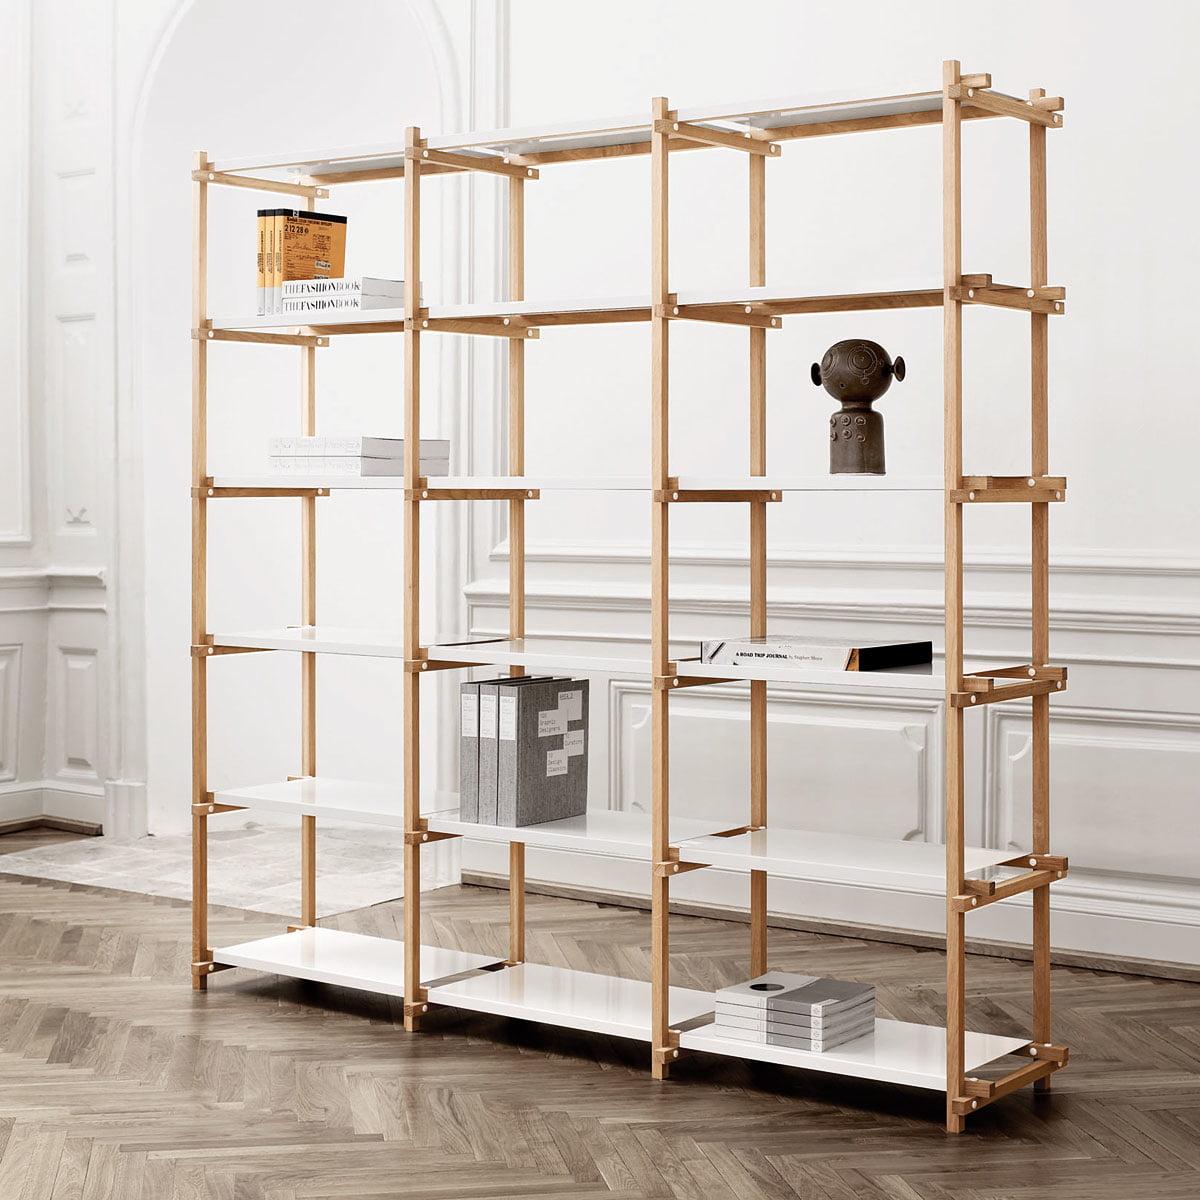 woody regal von hay connox shop. Black Bedroom Furniture Sets. Home Design Ideas